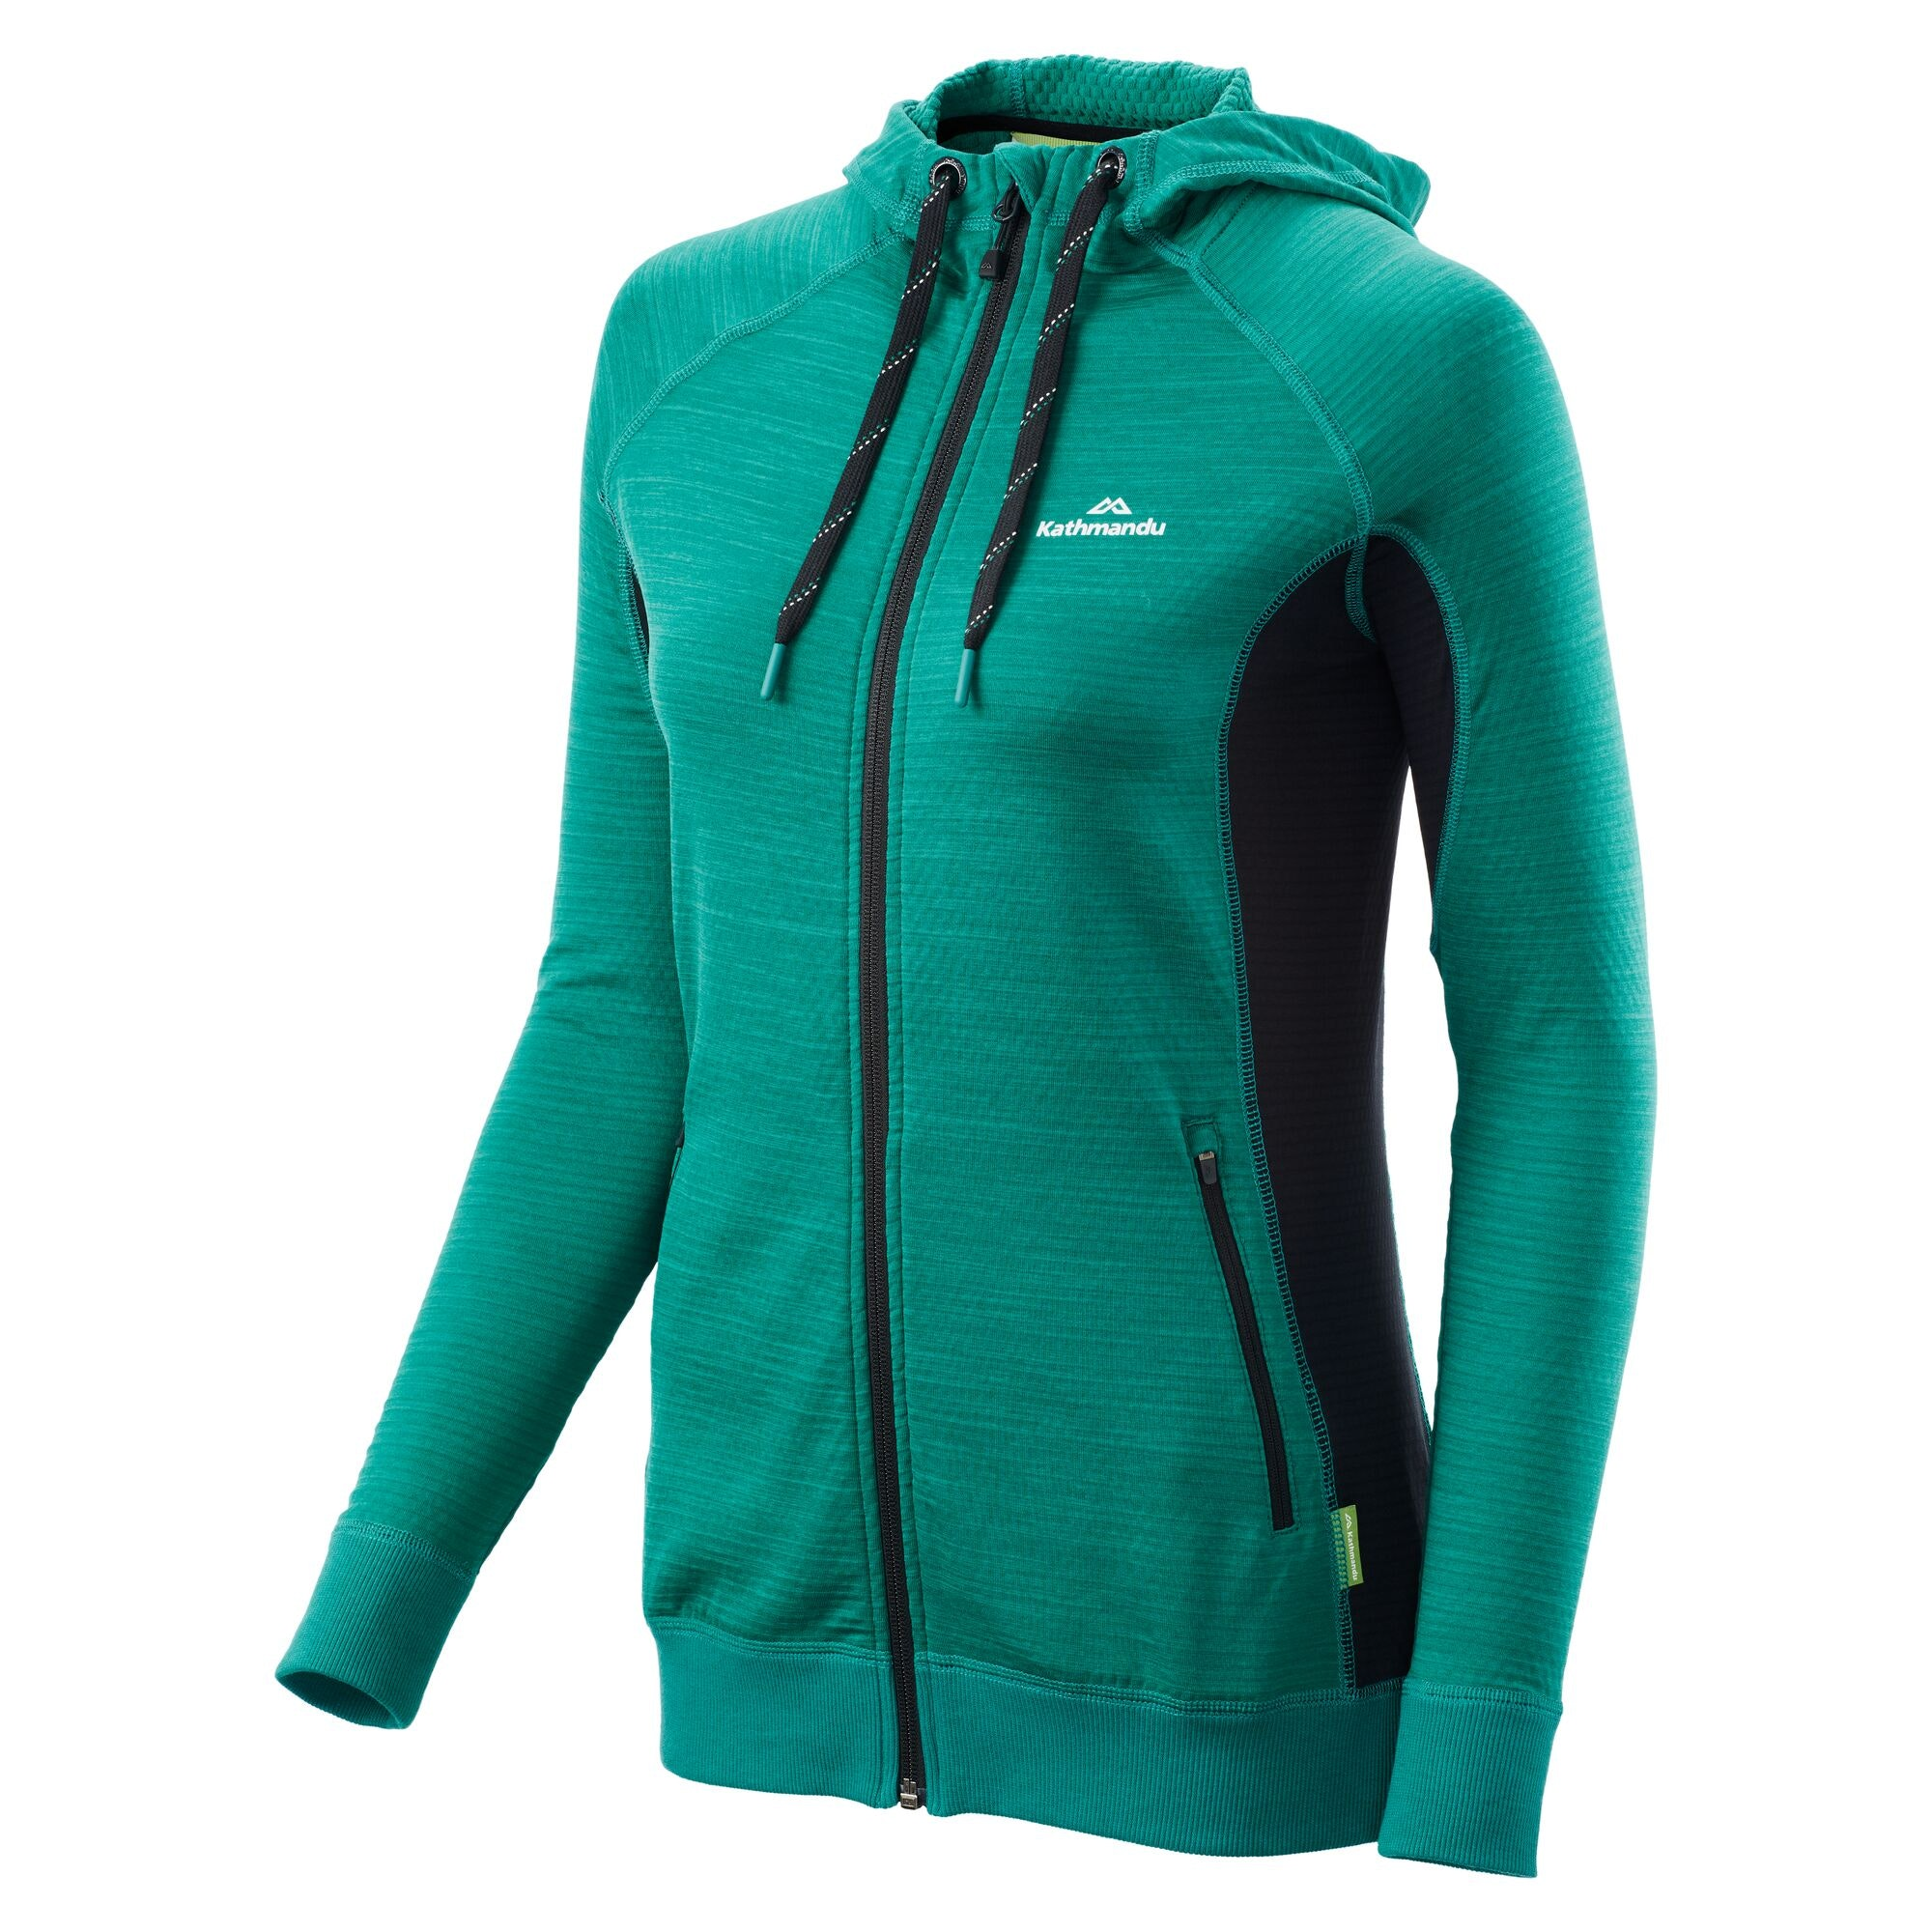 NEW-Kathmandu-Acota-Women-s-Hooded-Fleece-Lightweight-Breathable-Outdoor-Jacket thumbnail 14